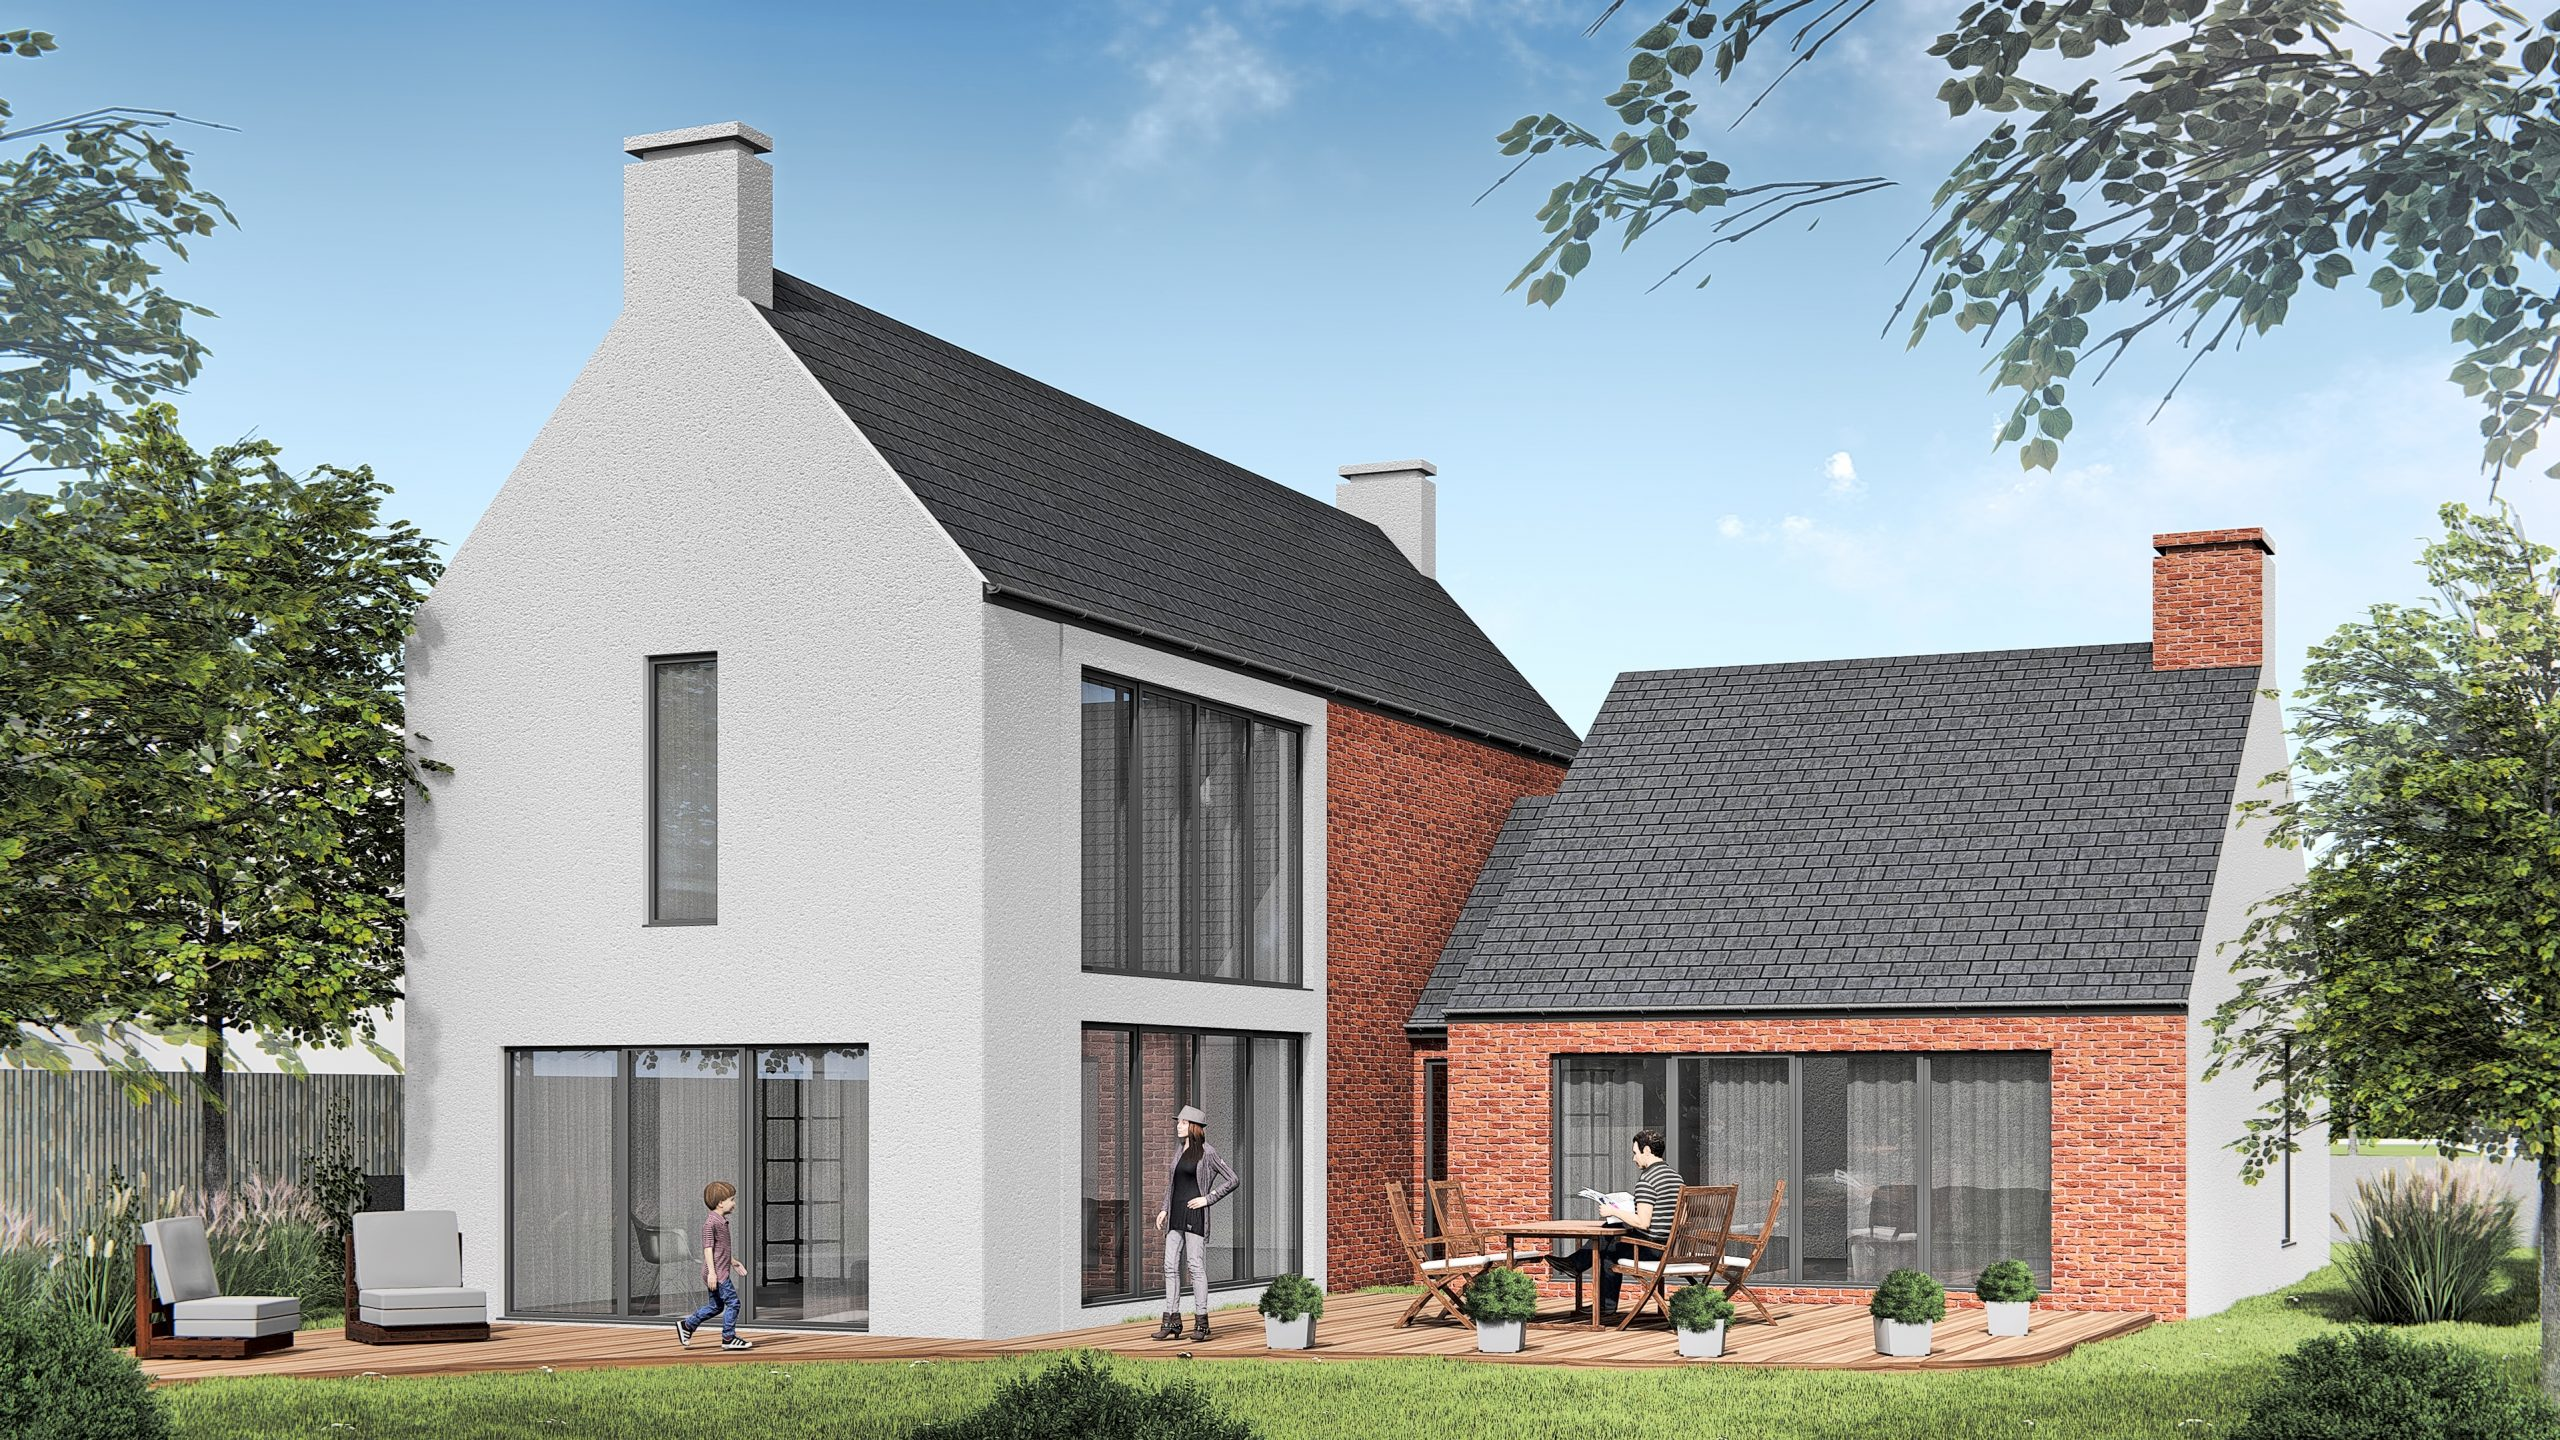 New build in Wall near Lichfield